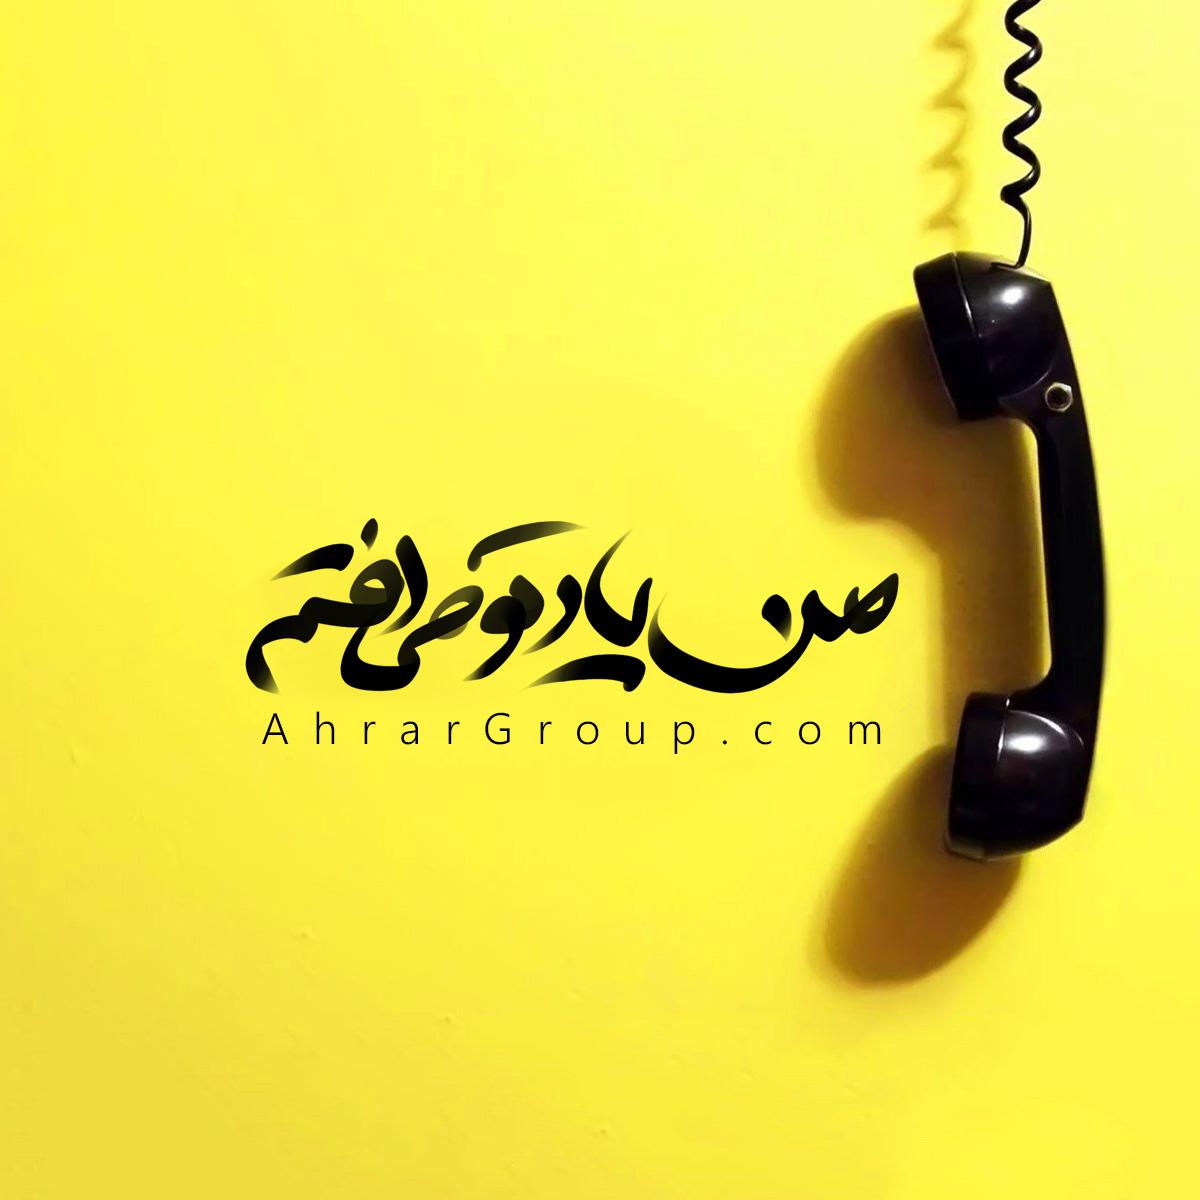 ahrargroup-1395